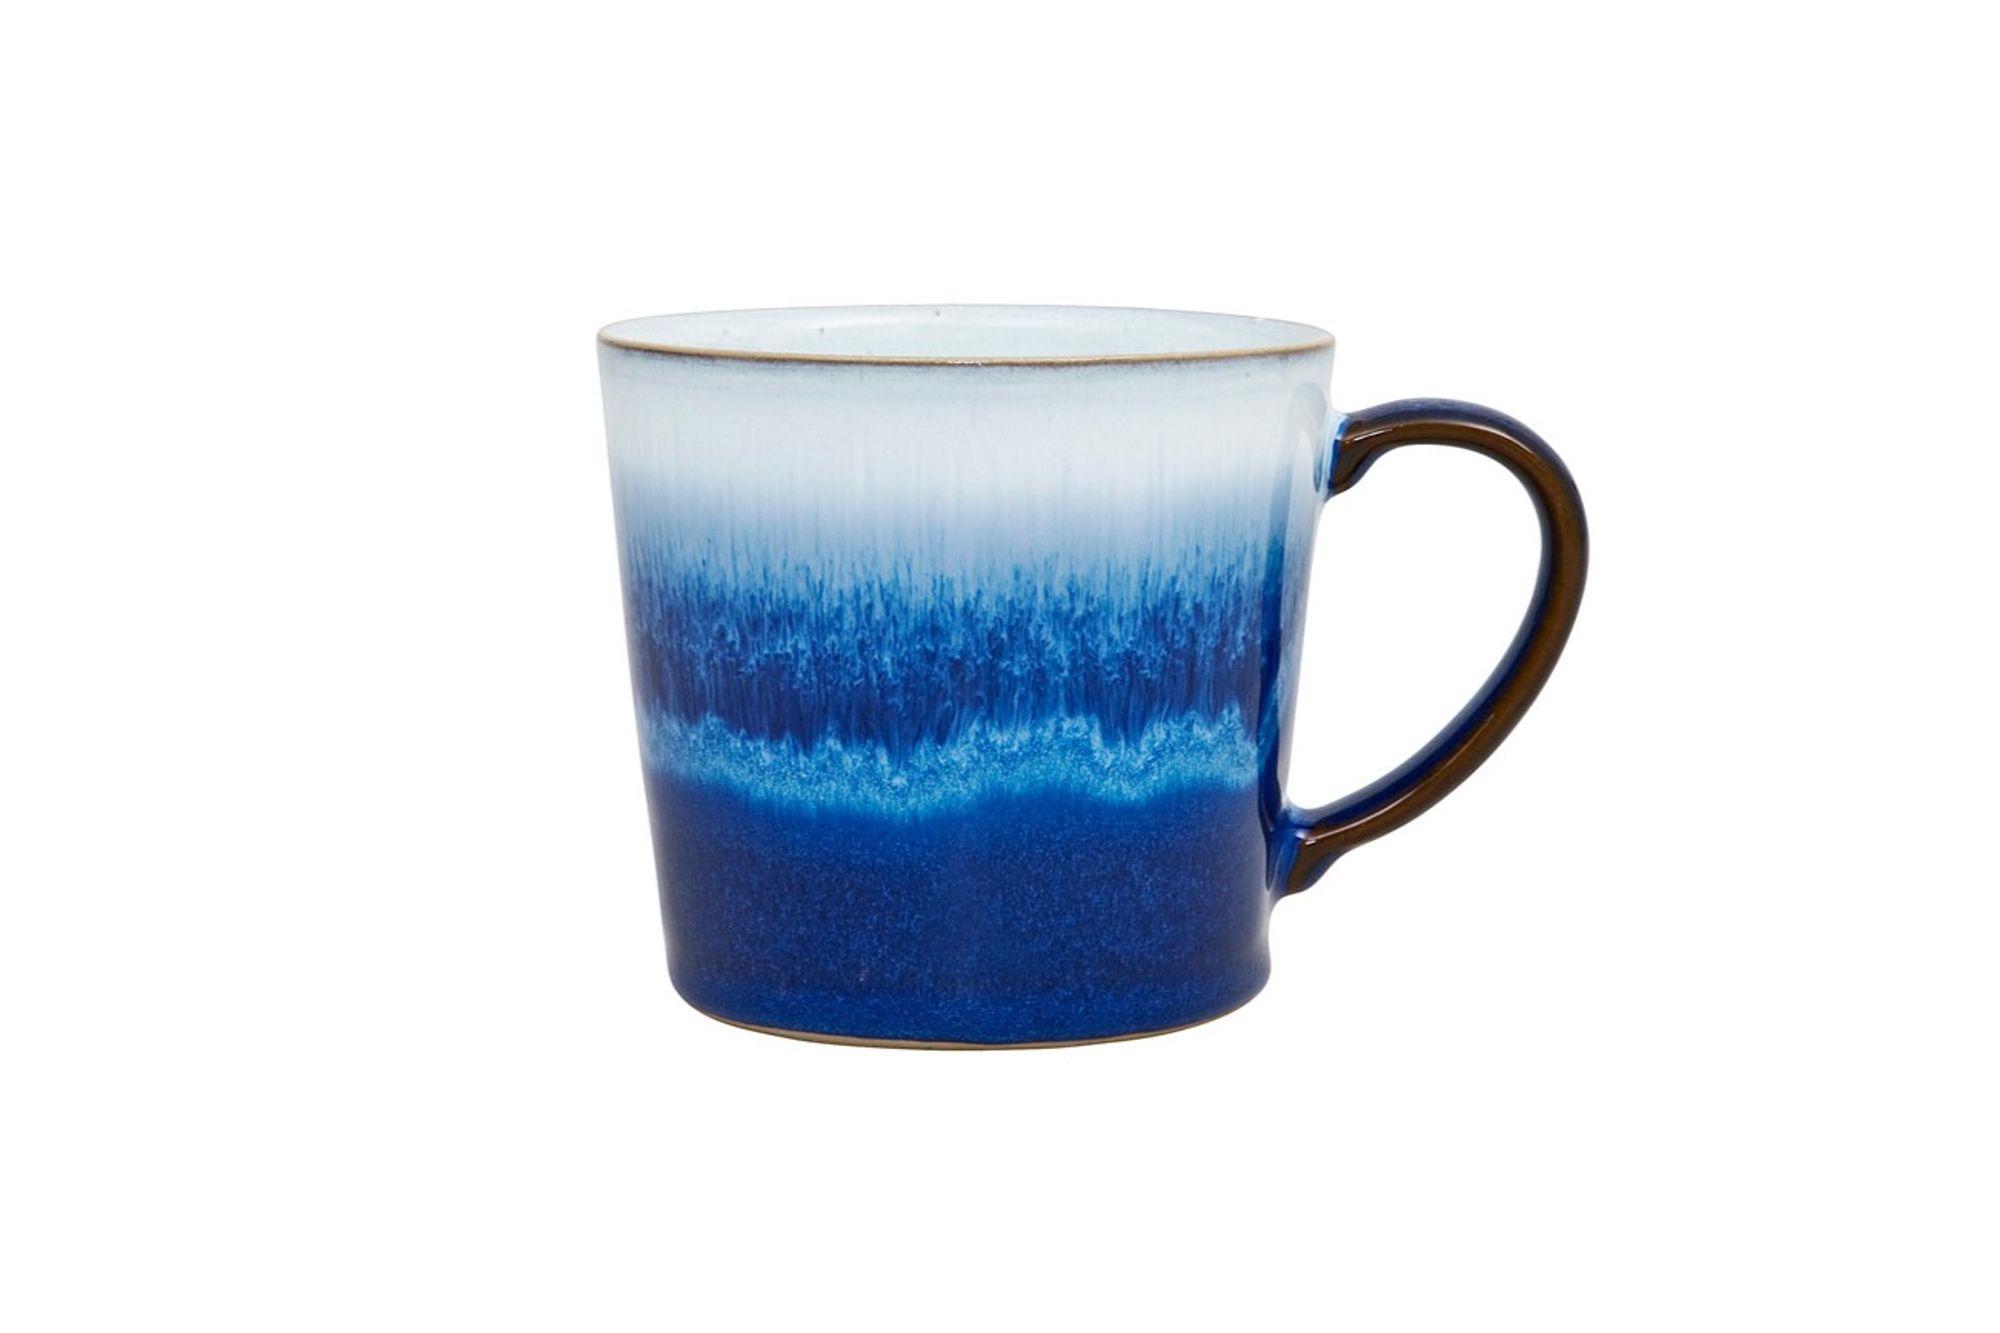 Denby Blue Haze Mug thumb 1